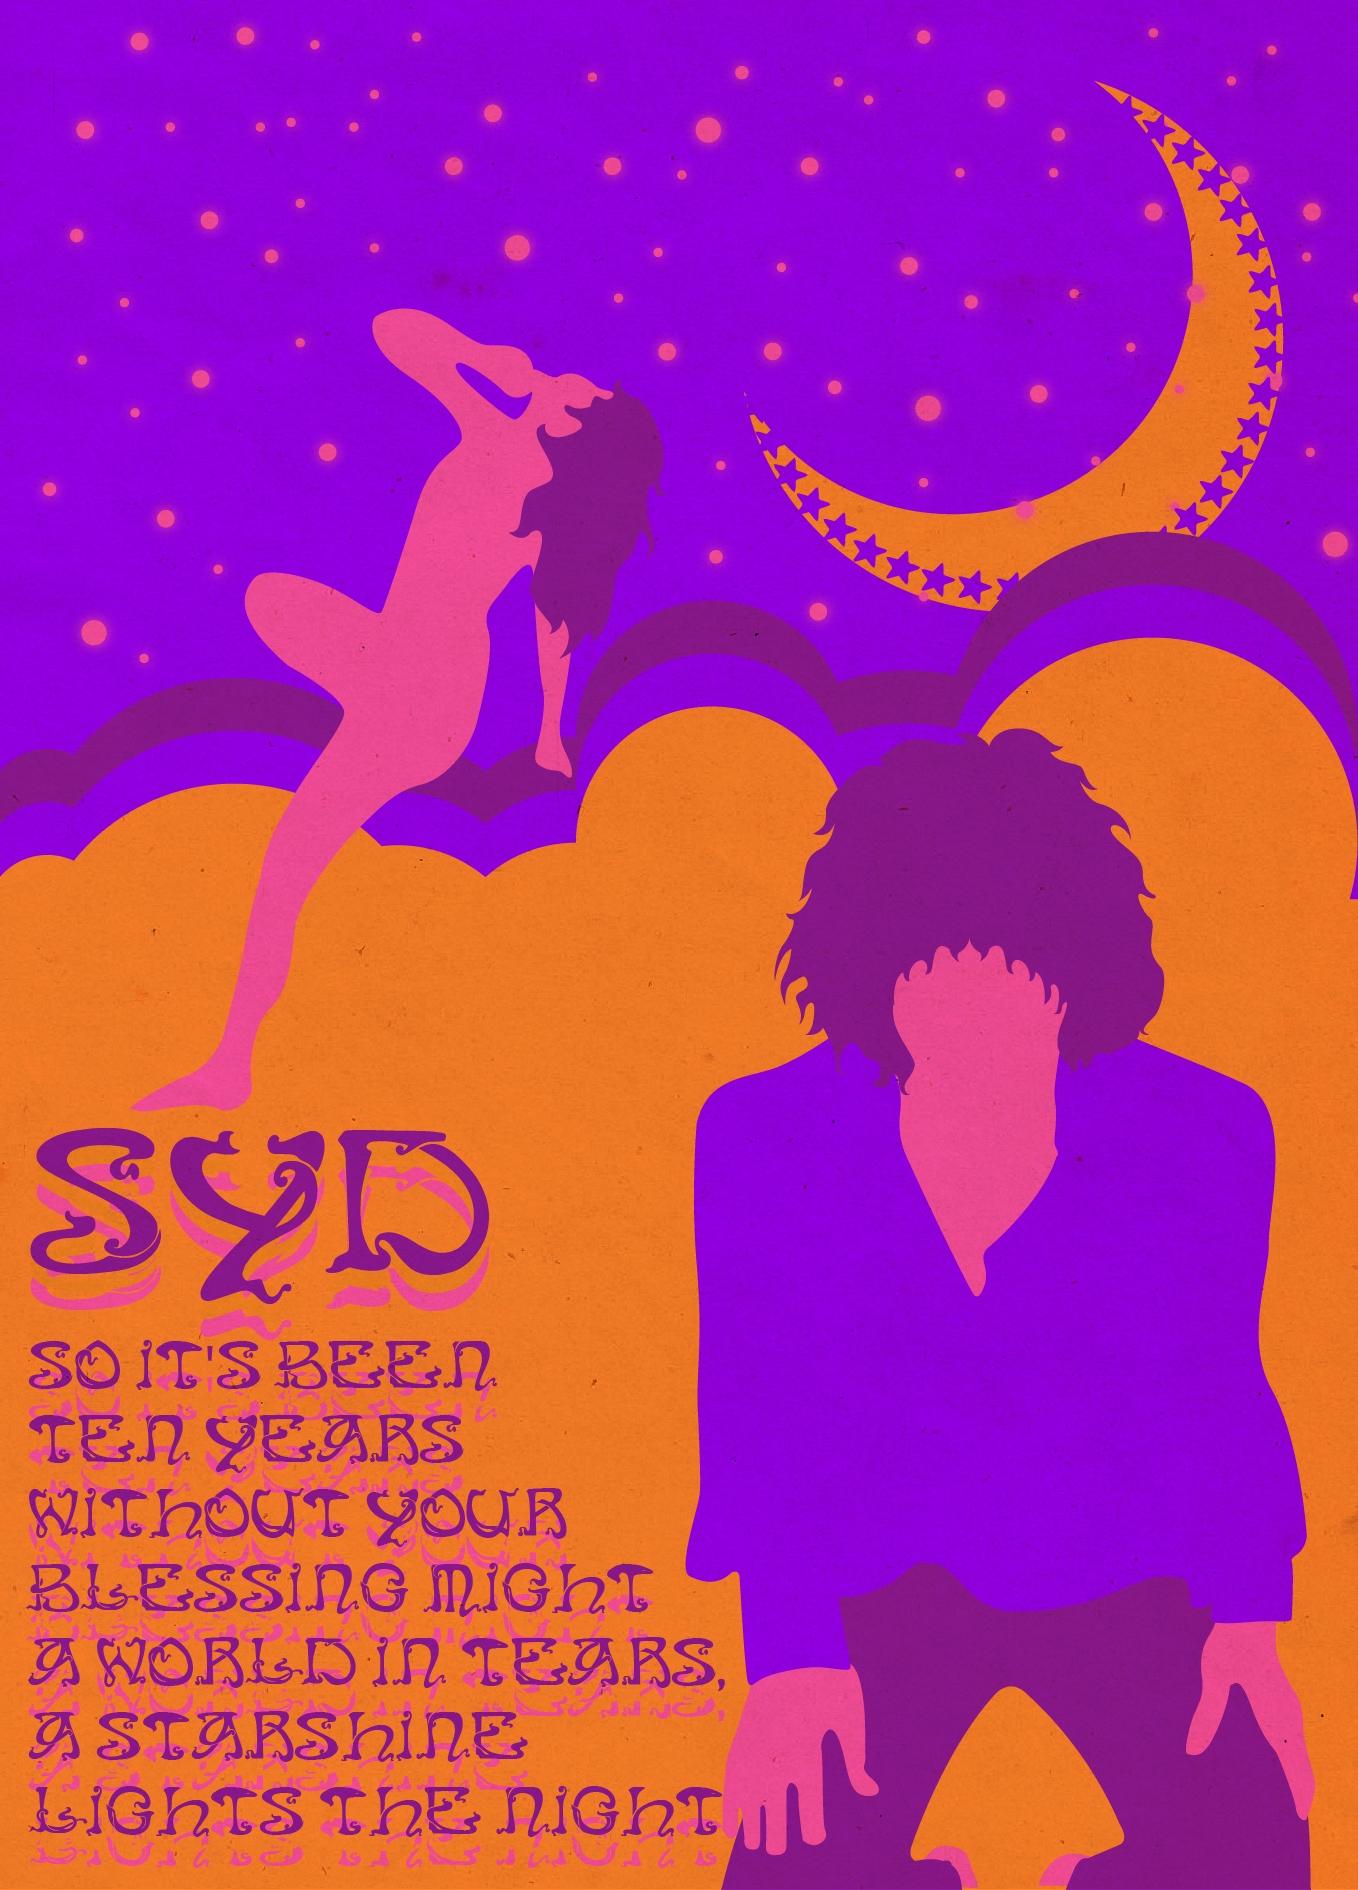 bass birthday! biggest Syd Barr - nefelits | ello